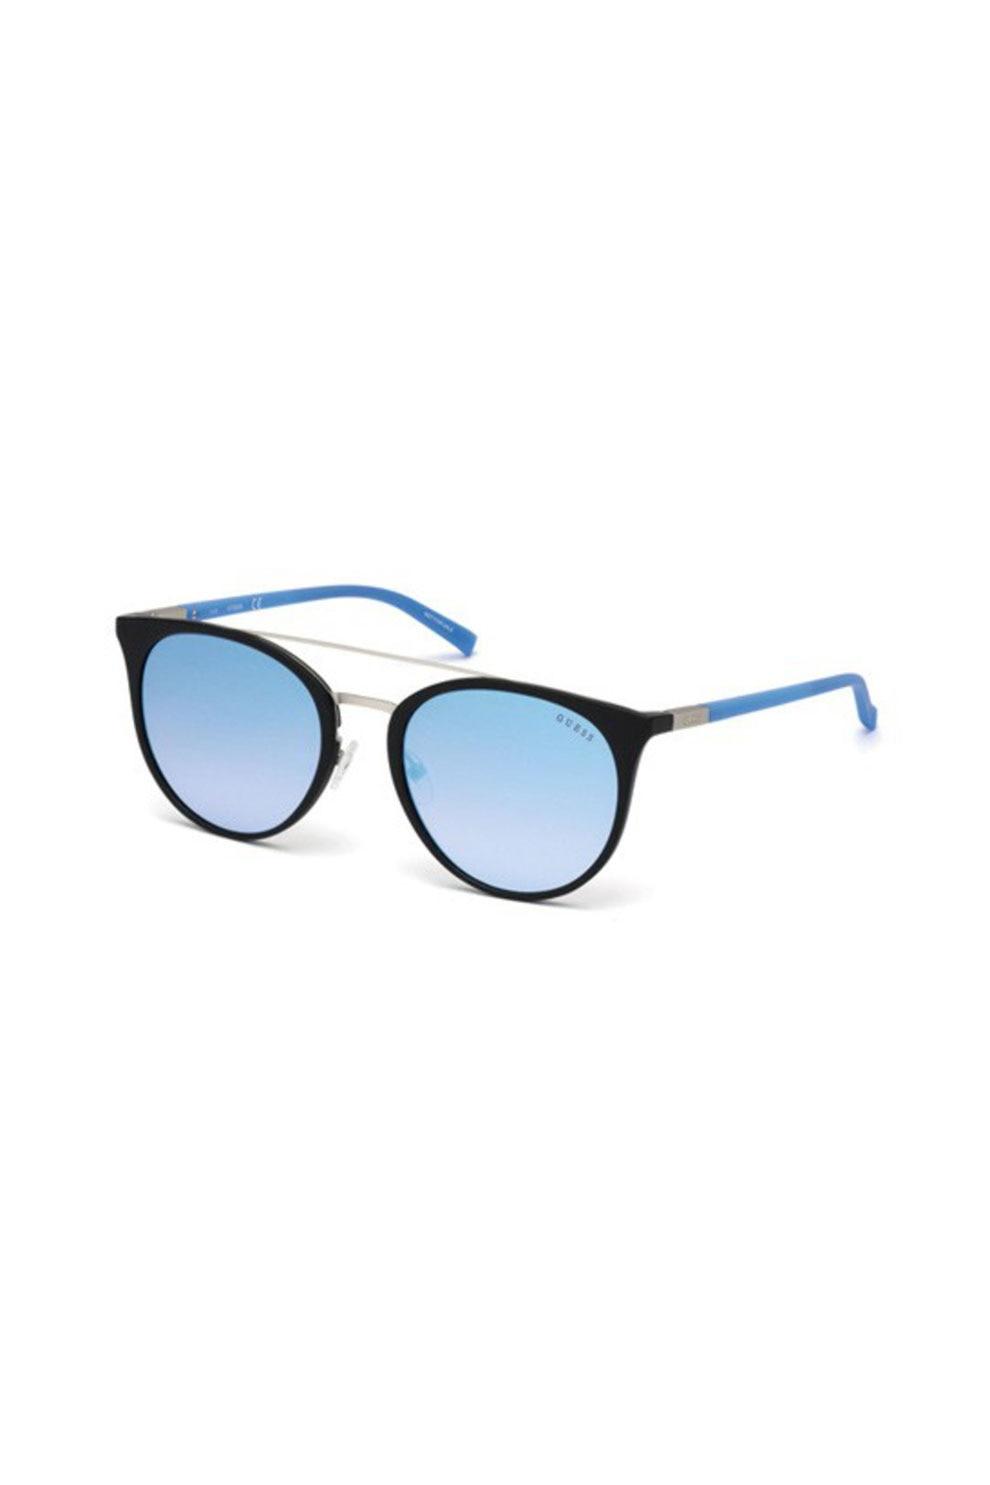 Fotografie Guess, Ochelari de soare aviator, unisex, cu lentile oglinda, Albastru lavanda, 56-20-140 Standard